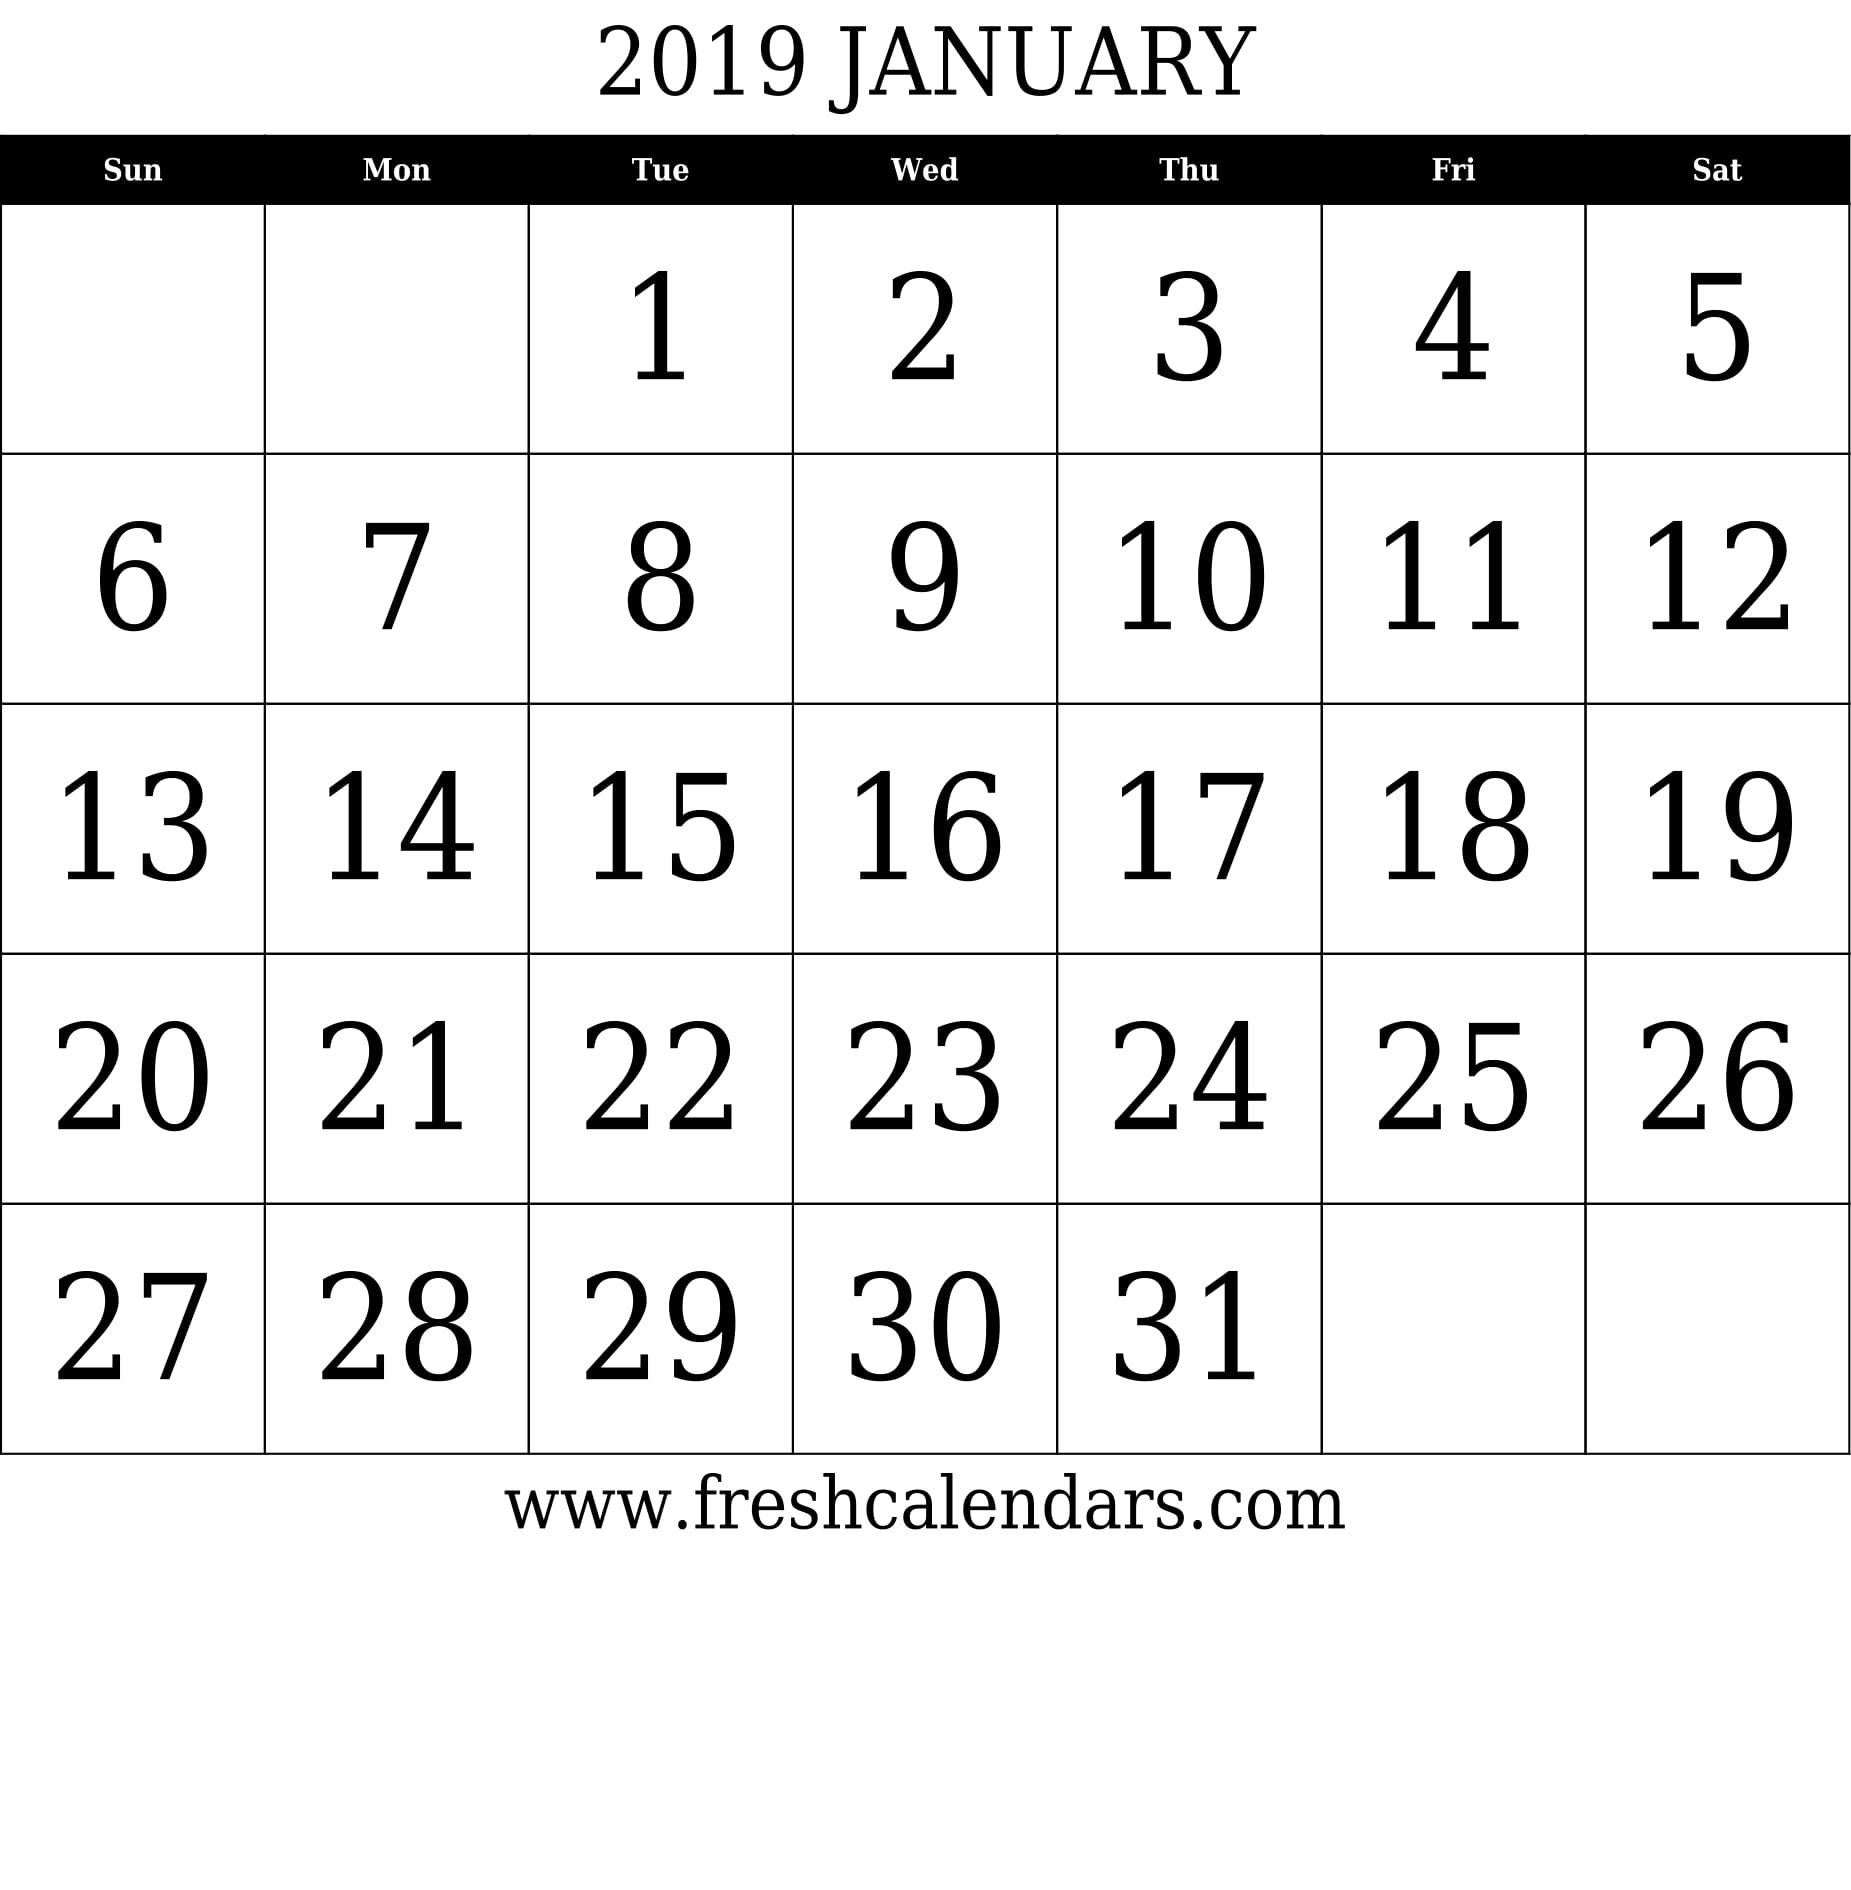 January 2019 Printable Calendars – Fresh Calendars January 7 2019 Calendar